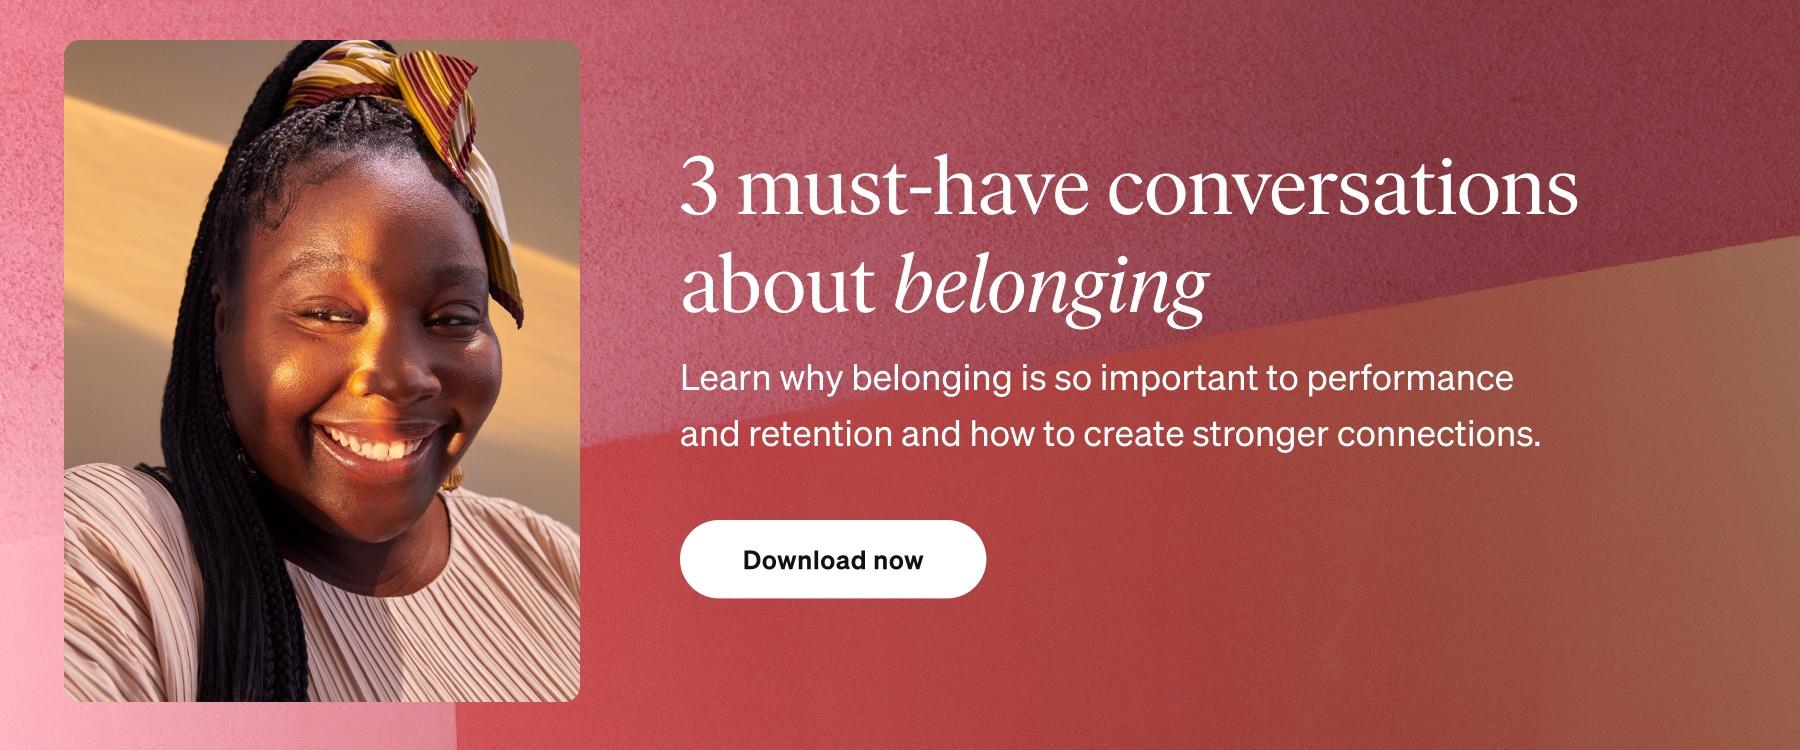 belonging-conversations-cta